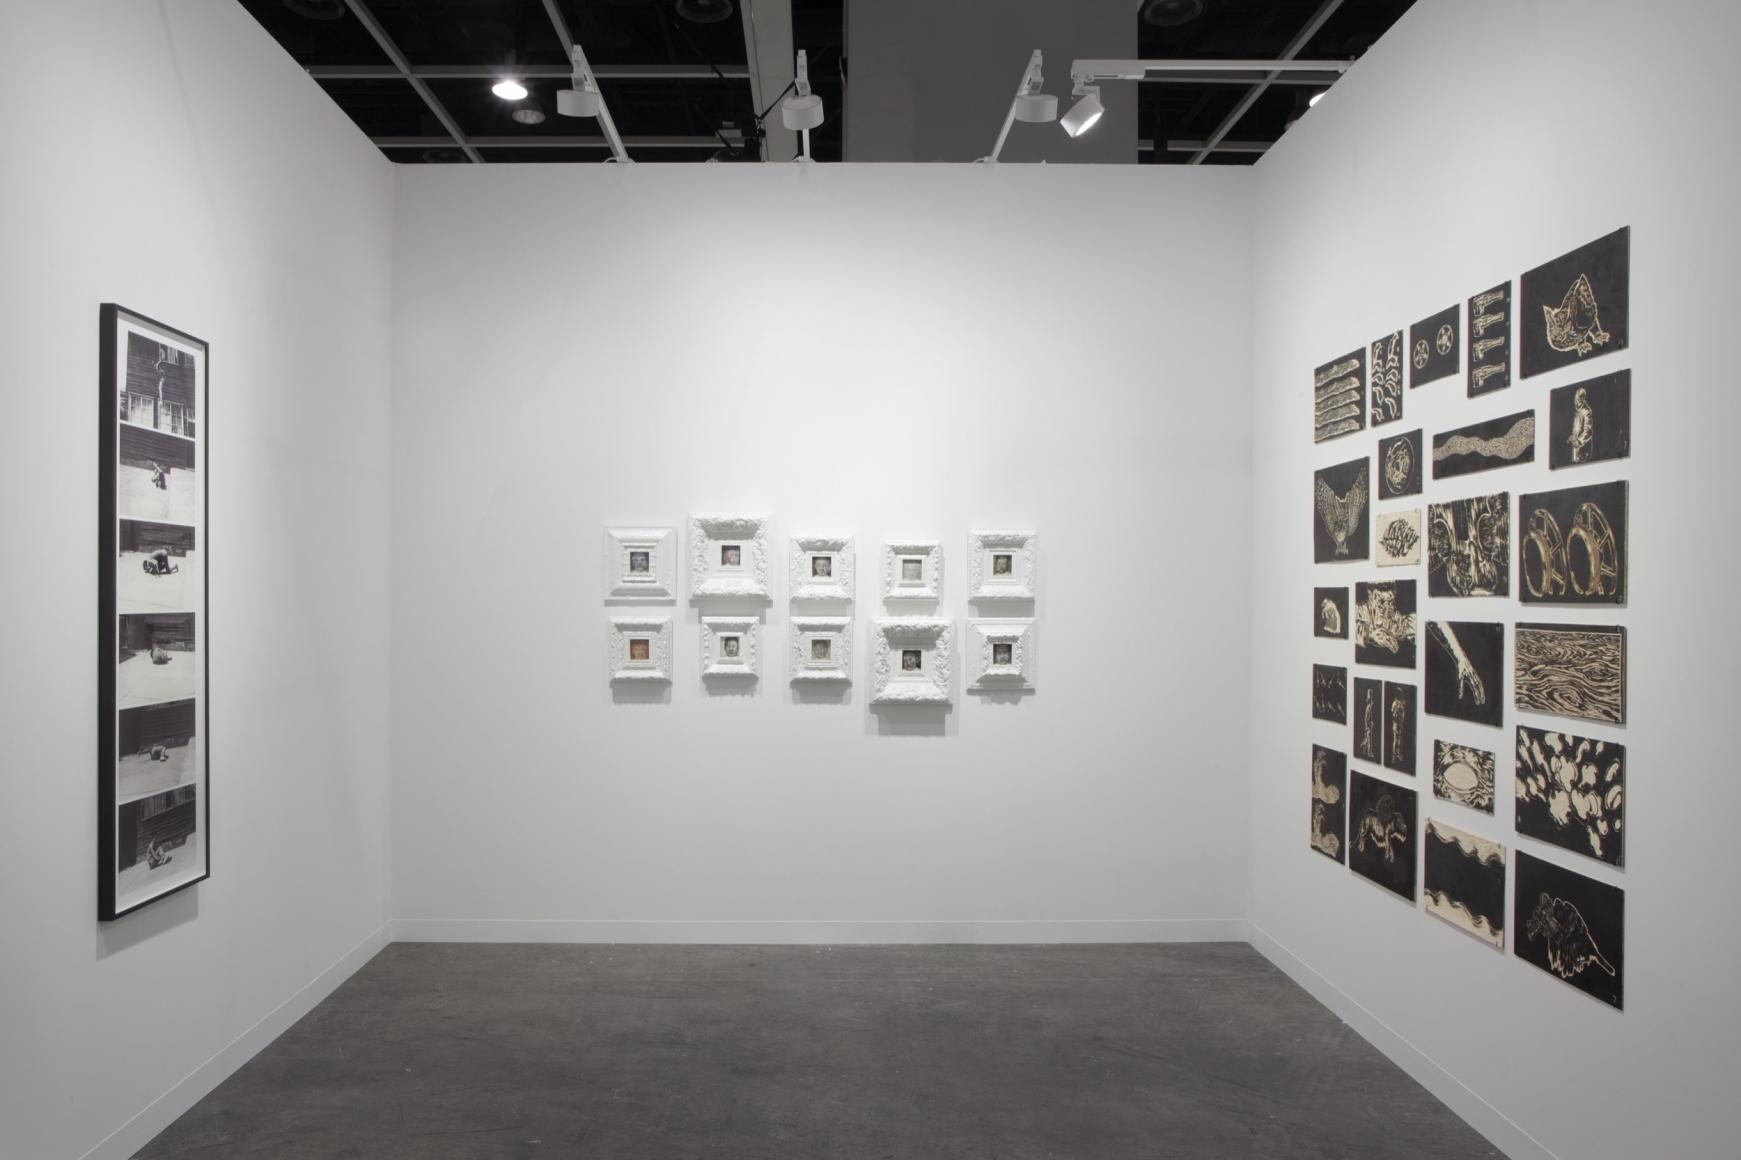 Booth 1B17 - Art Basel Hong Kong 2019 - Art Fairs - Sean Kelly Gallery